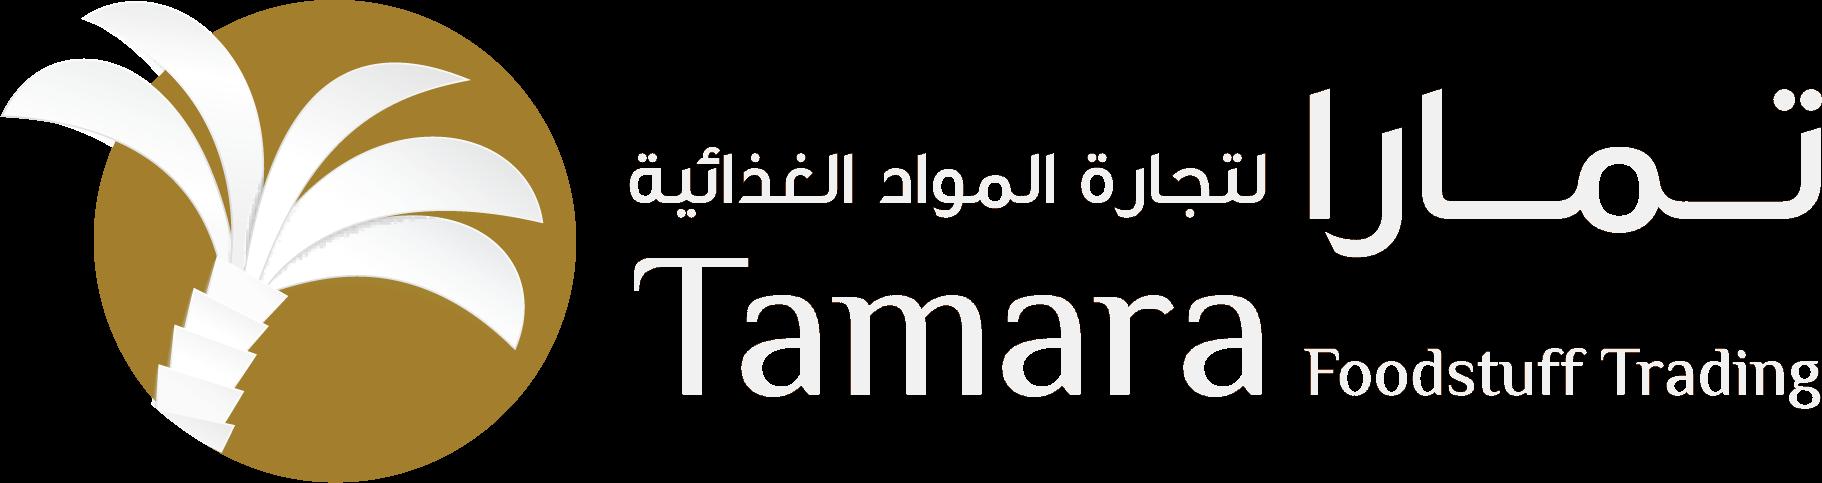 Tamara Foodstuff Trading | Company Profile